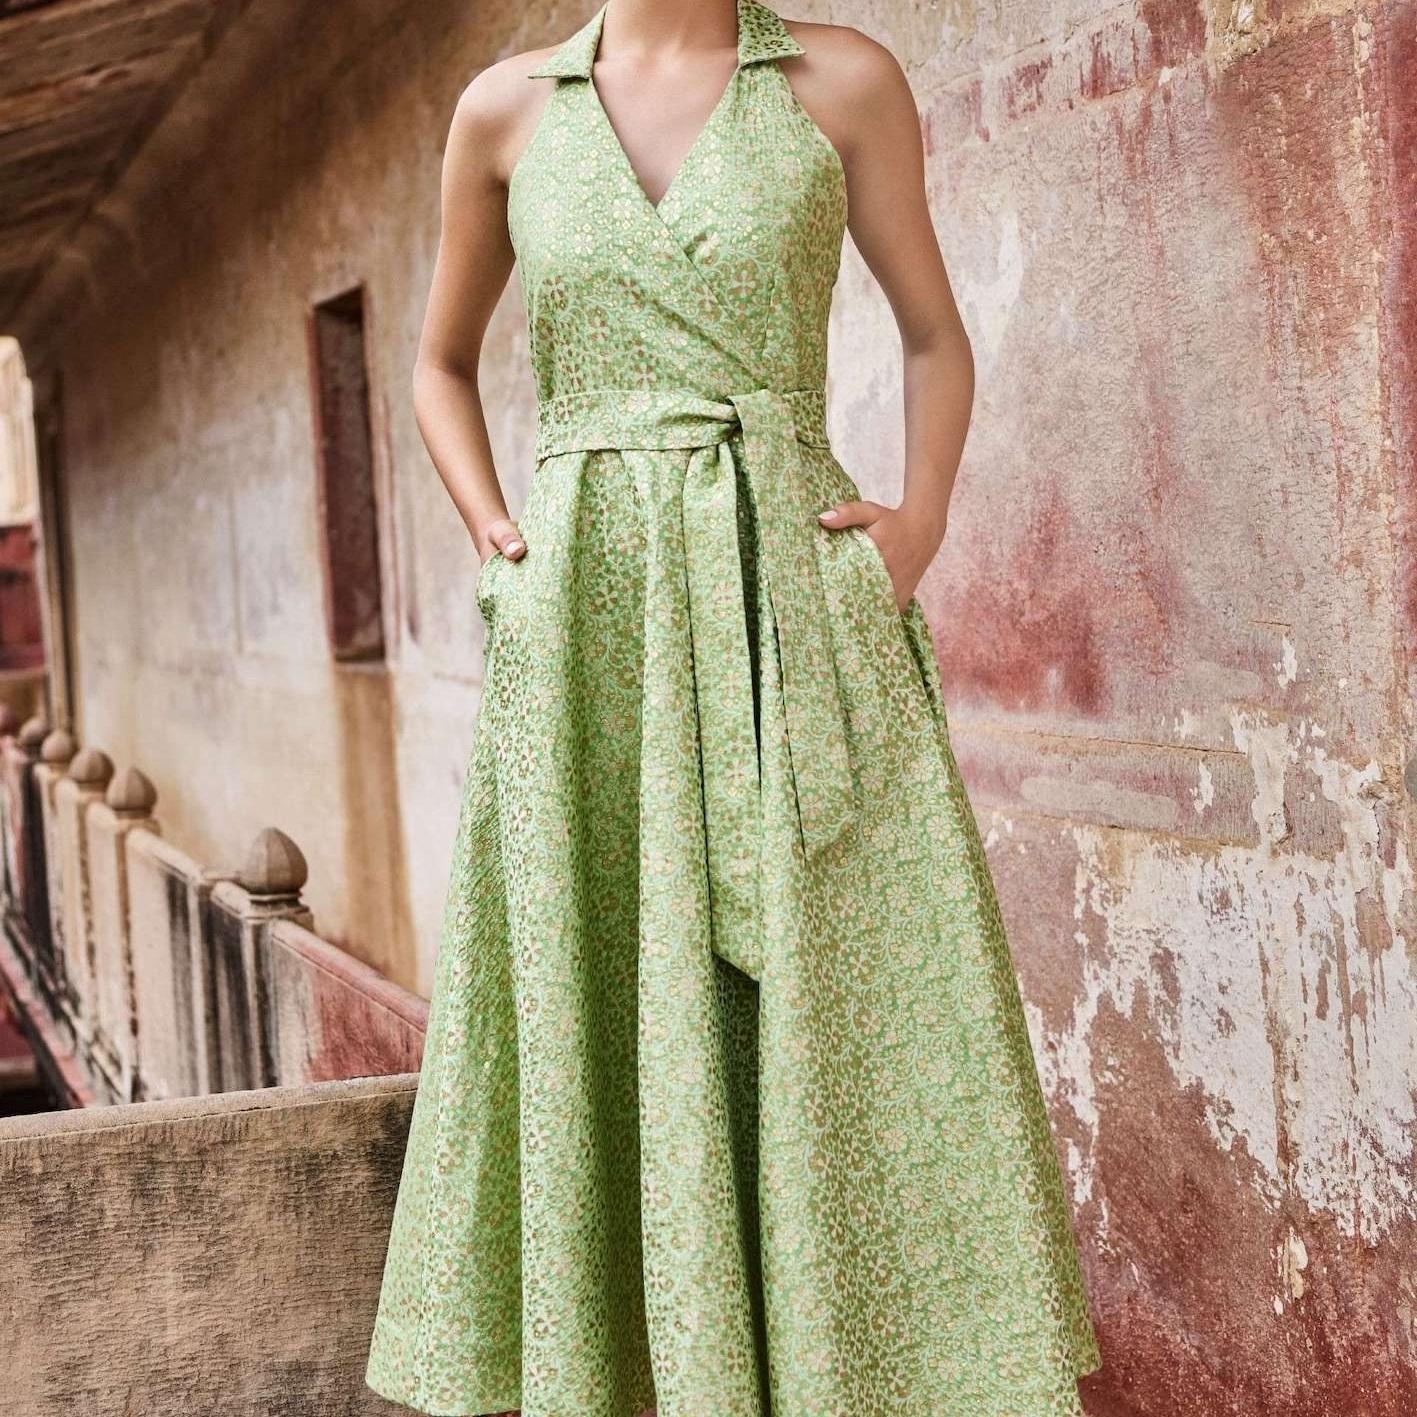 Sustainable India 10 Indian Ethical Fashion Brands I Love Jewelled Buddha